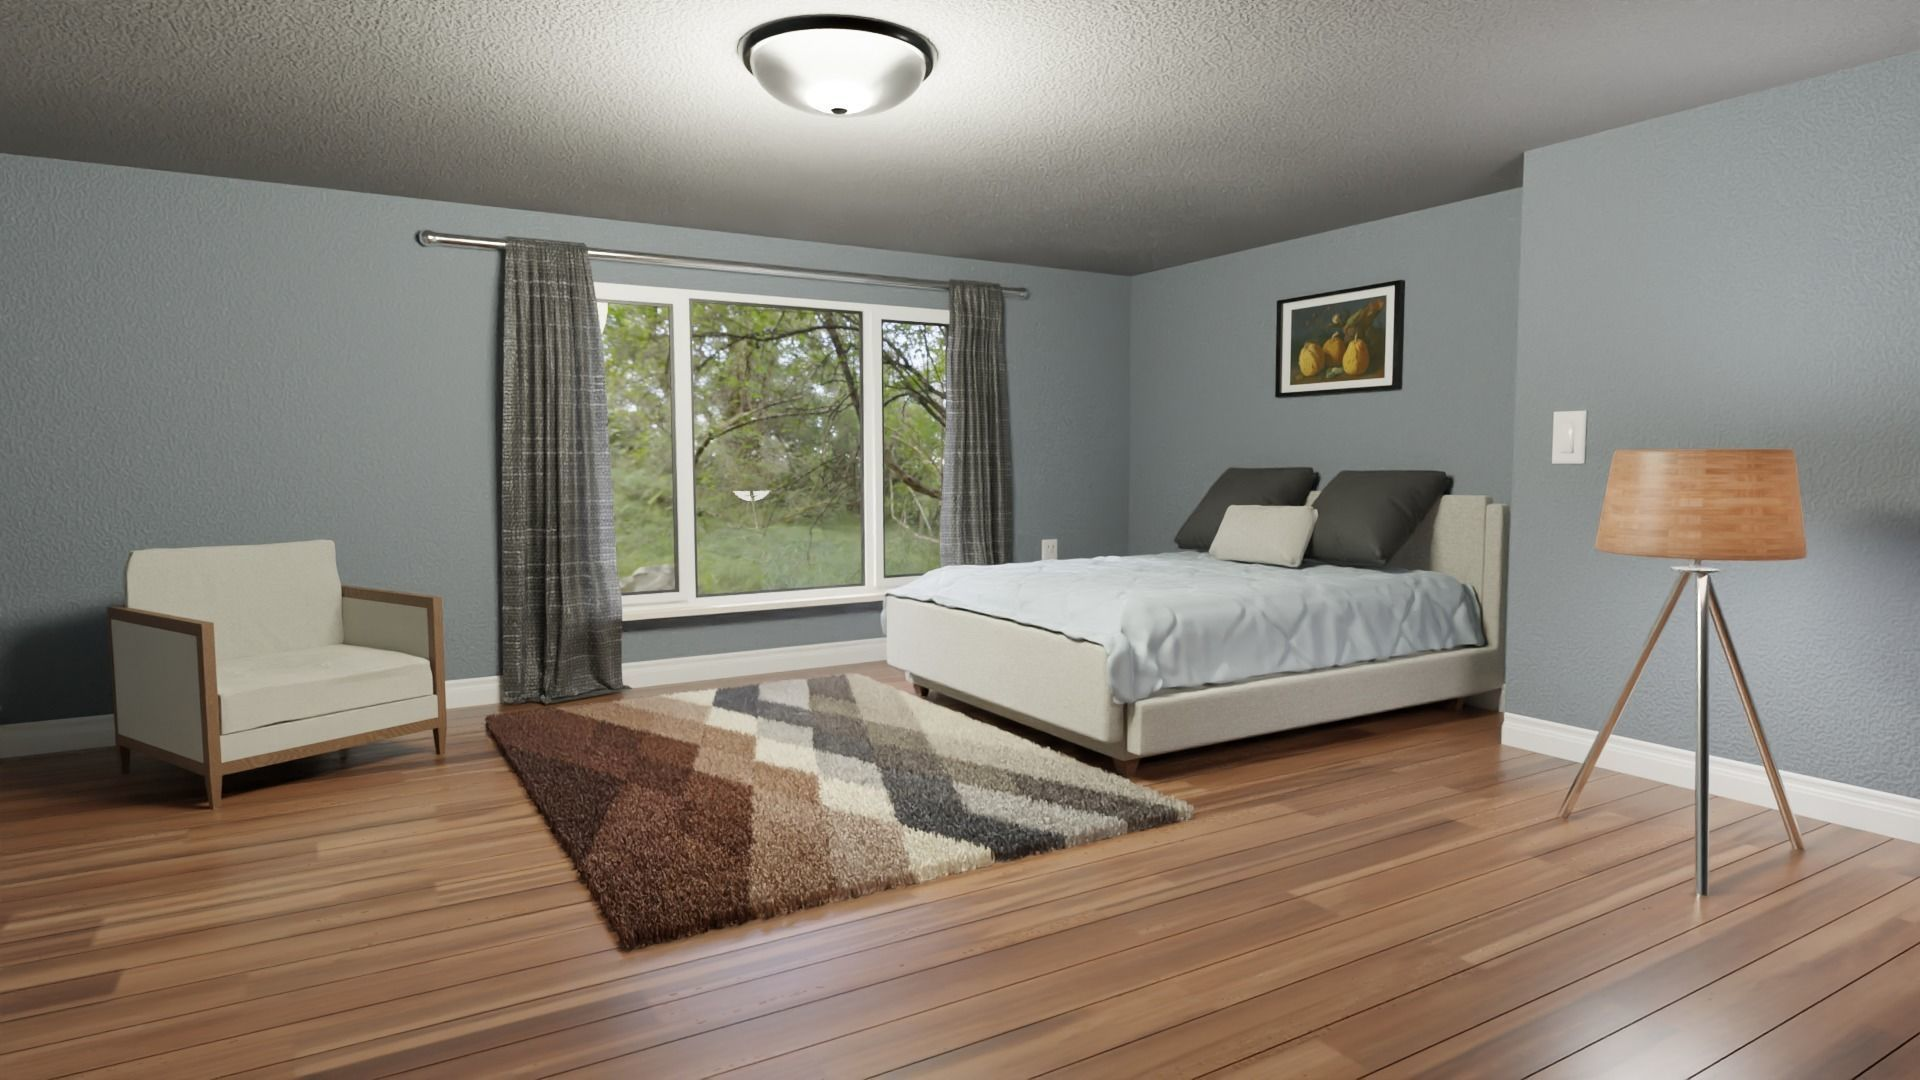 Realistic Bedroom